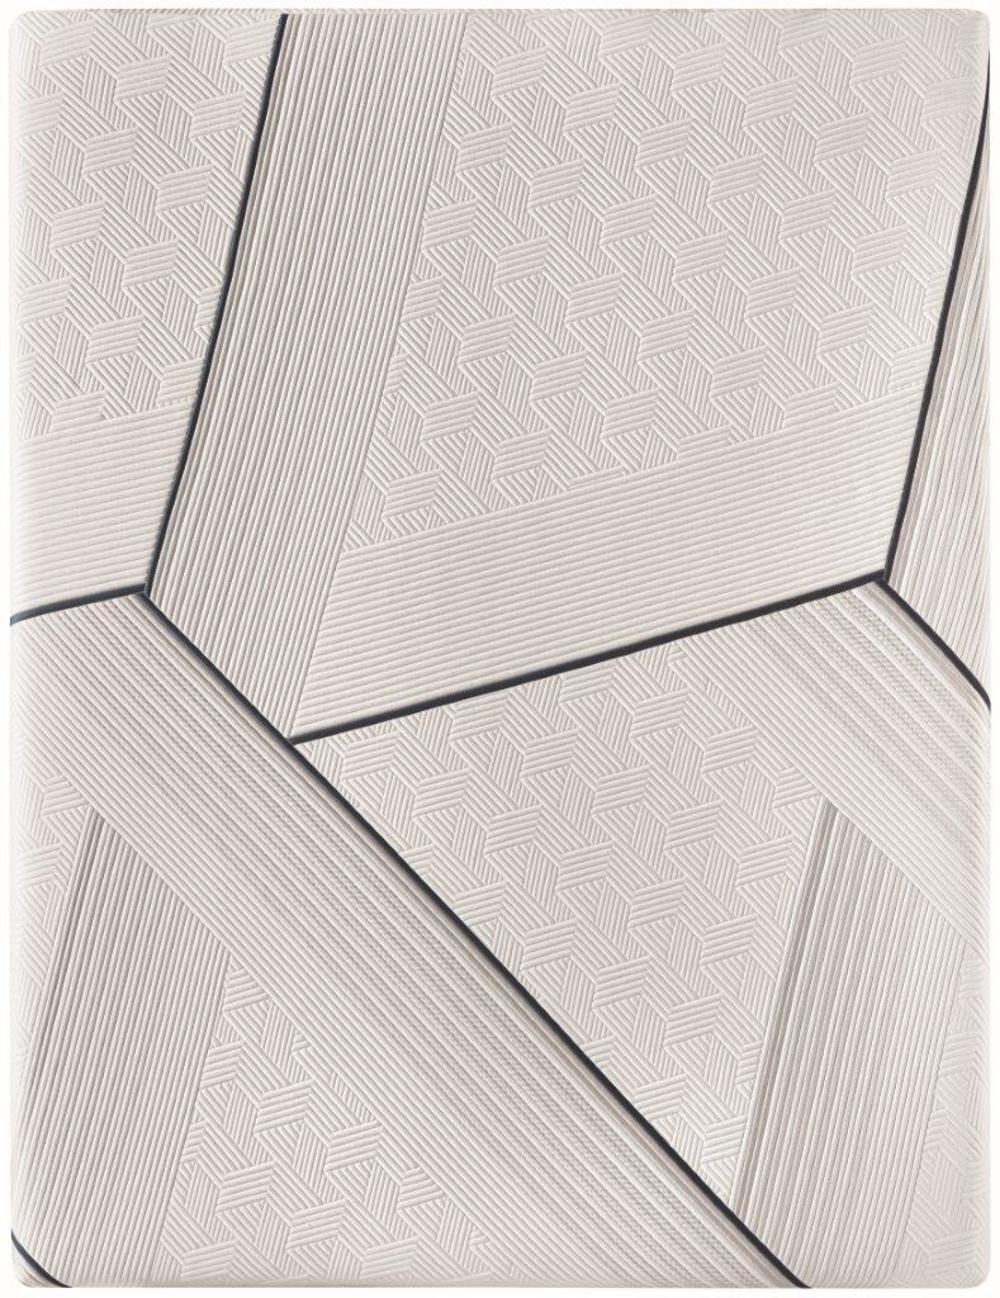 Serta Mattress - iComfort CF3000 Non-Quilted Hybrid Medium Mattress with Standard Box Spring